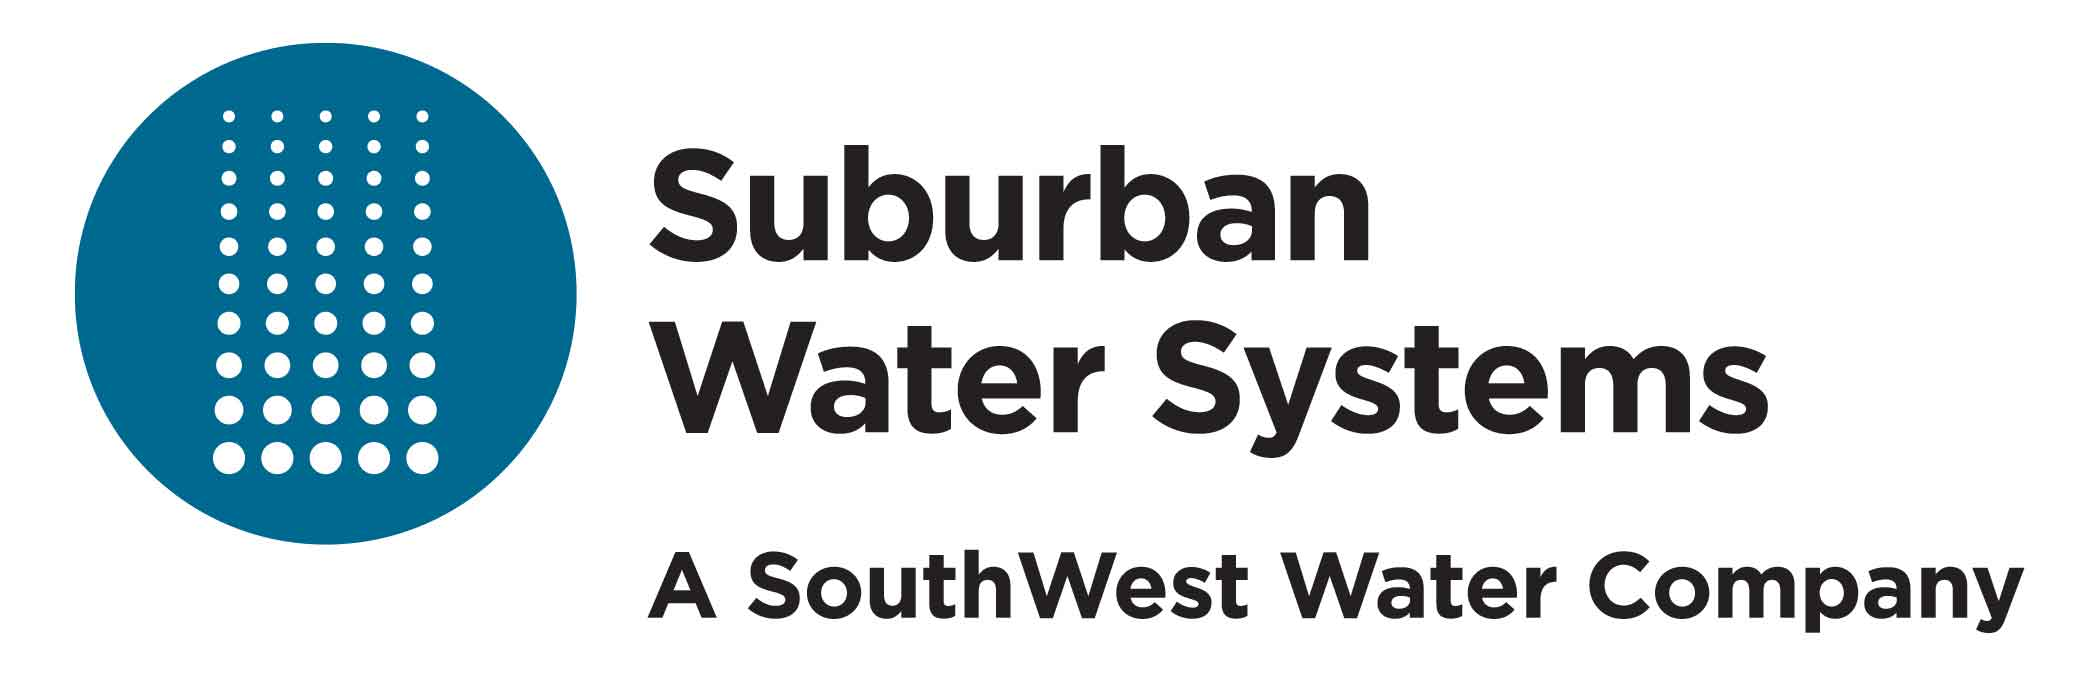 Silver - Suburban Water Systems - Logo